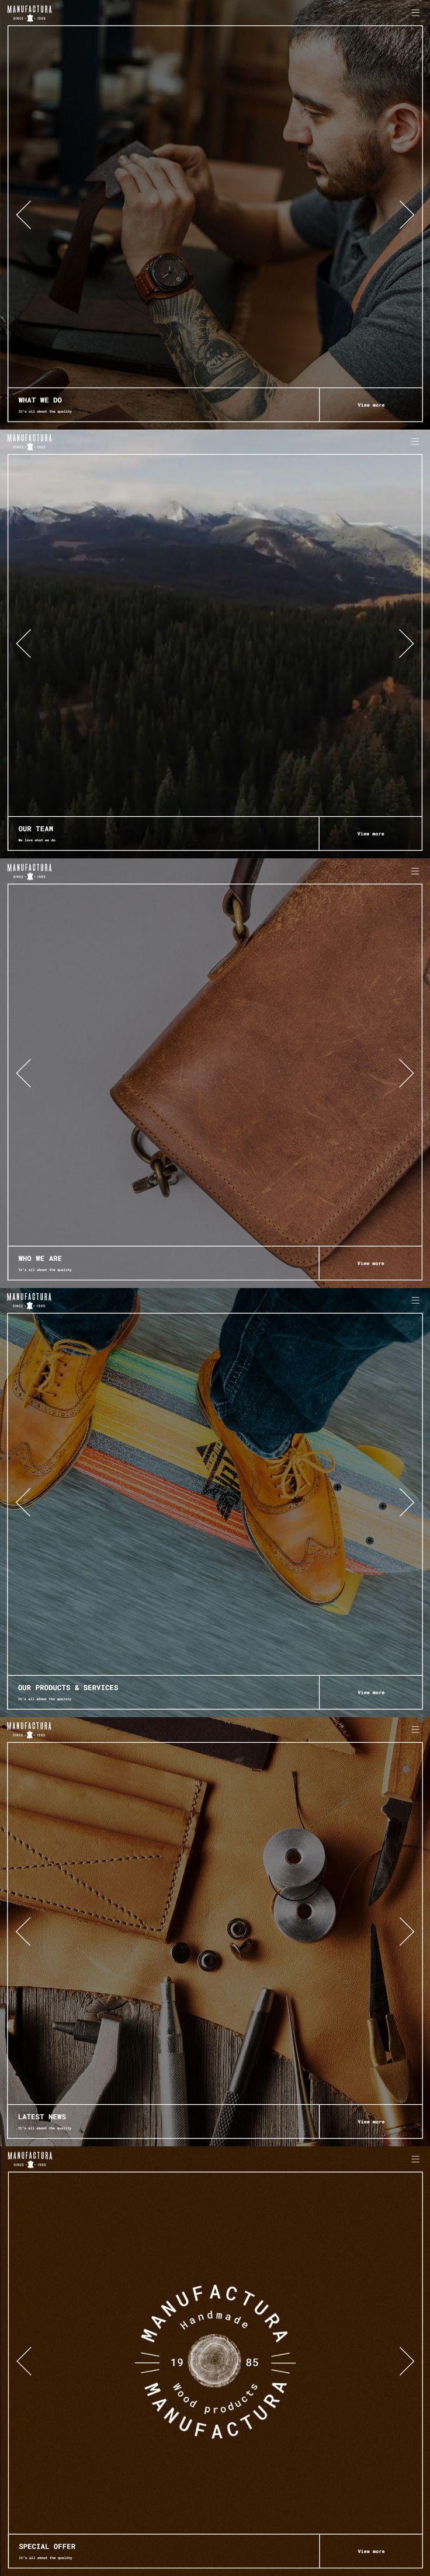 #slideshow #manufactura #WordPress #theme #arts #crafts  #handmade #websites  #leathercraft #carpentry  #jewelryshop  #responsive #retinaready